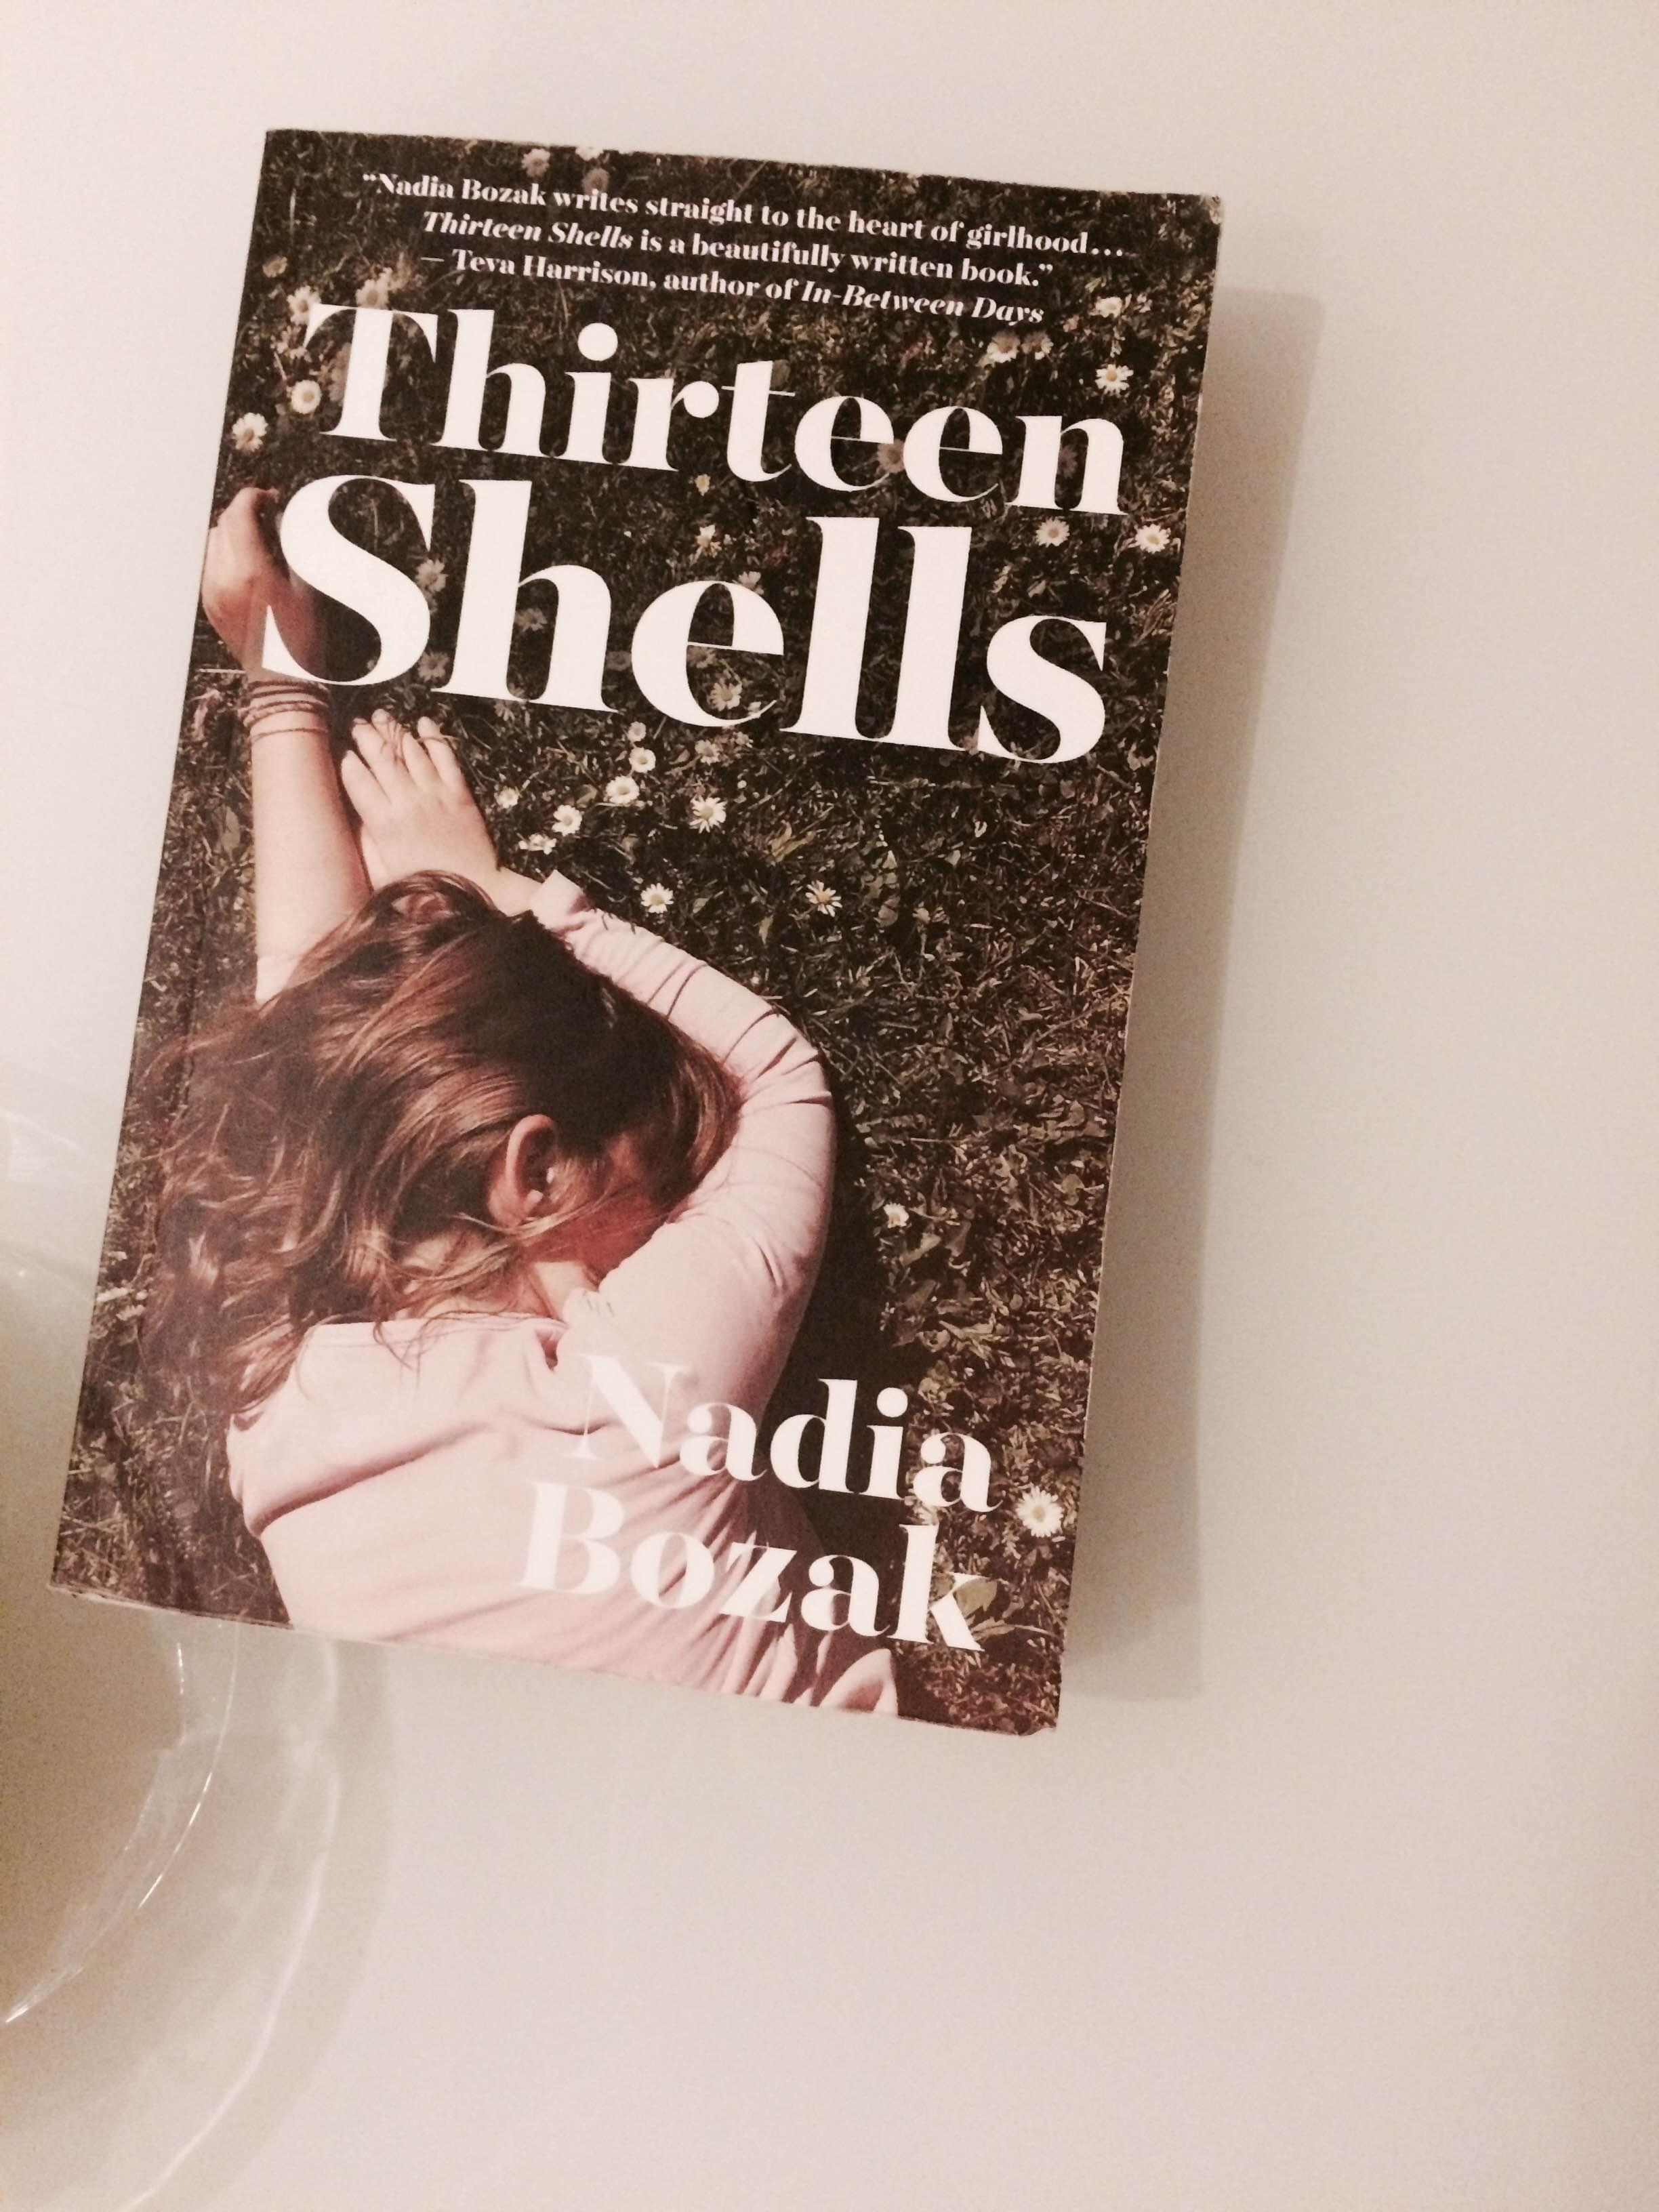 "Lesley Leroux On €�thirteen Shells"" By Nadia Bozak"